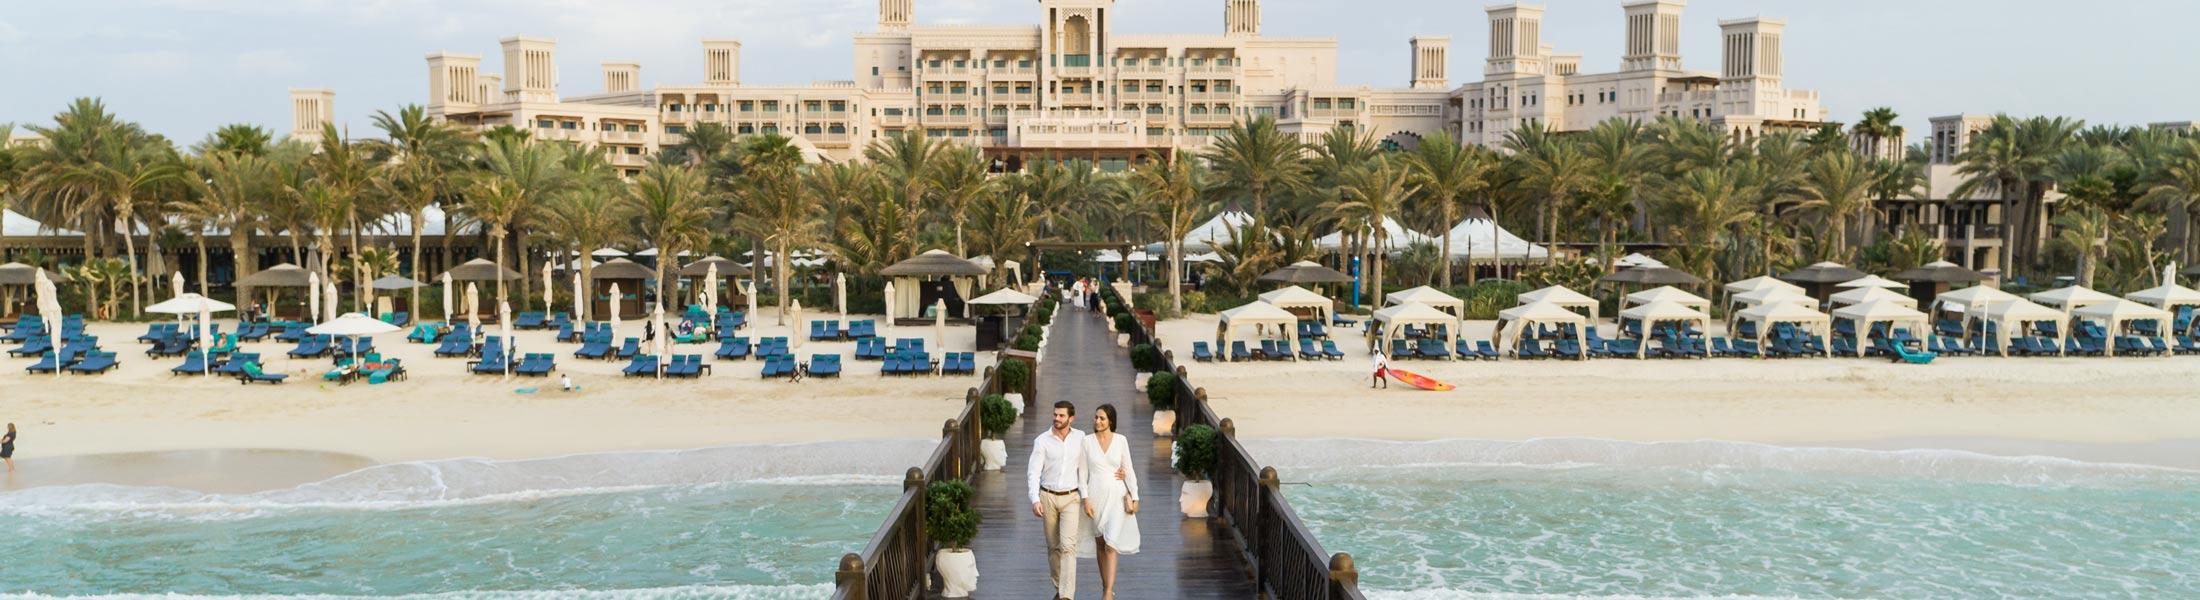 a Couple walking along the Pier at the Jumeirah Al Qasr